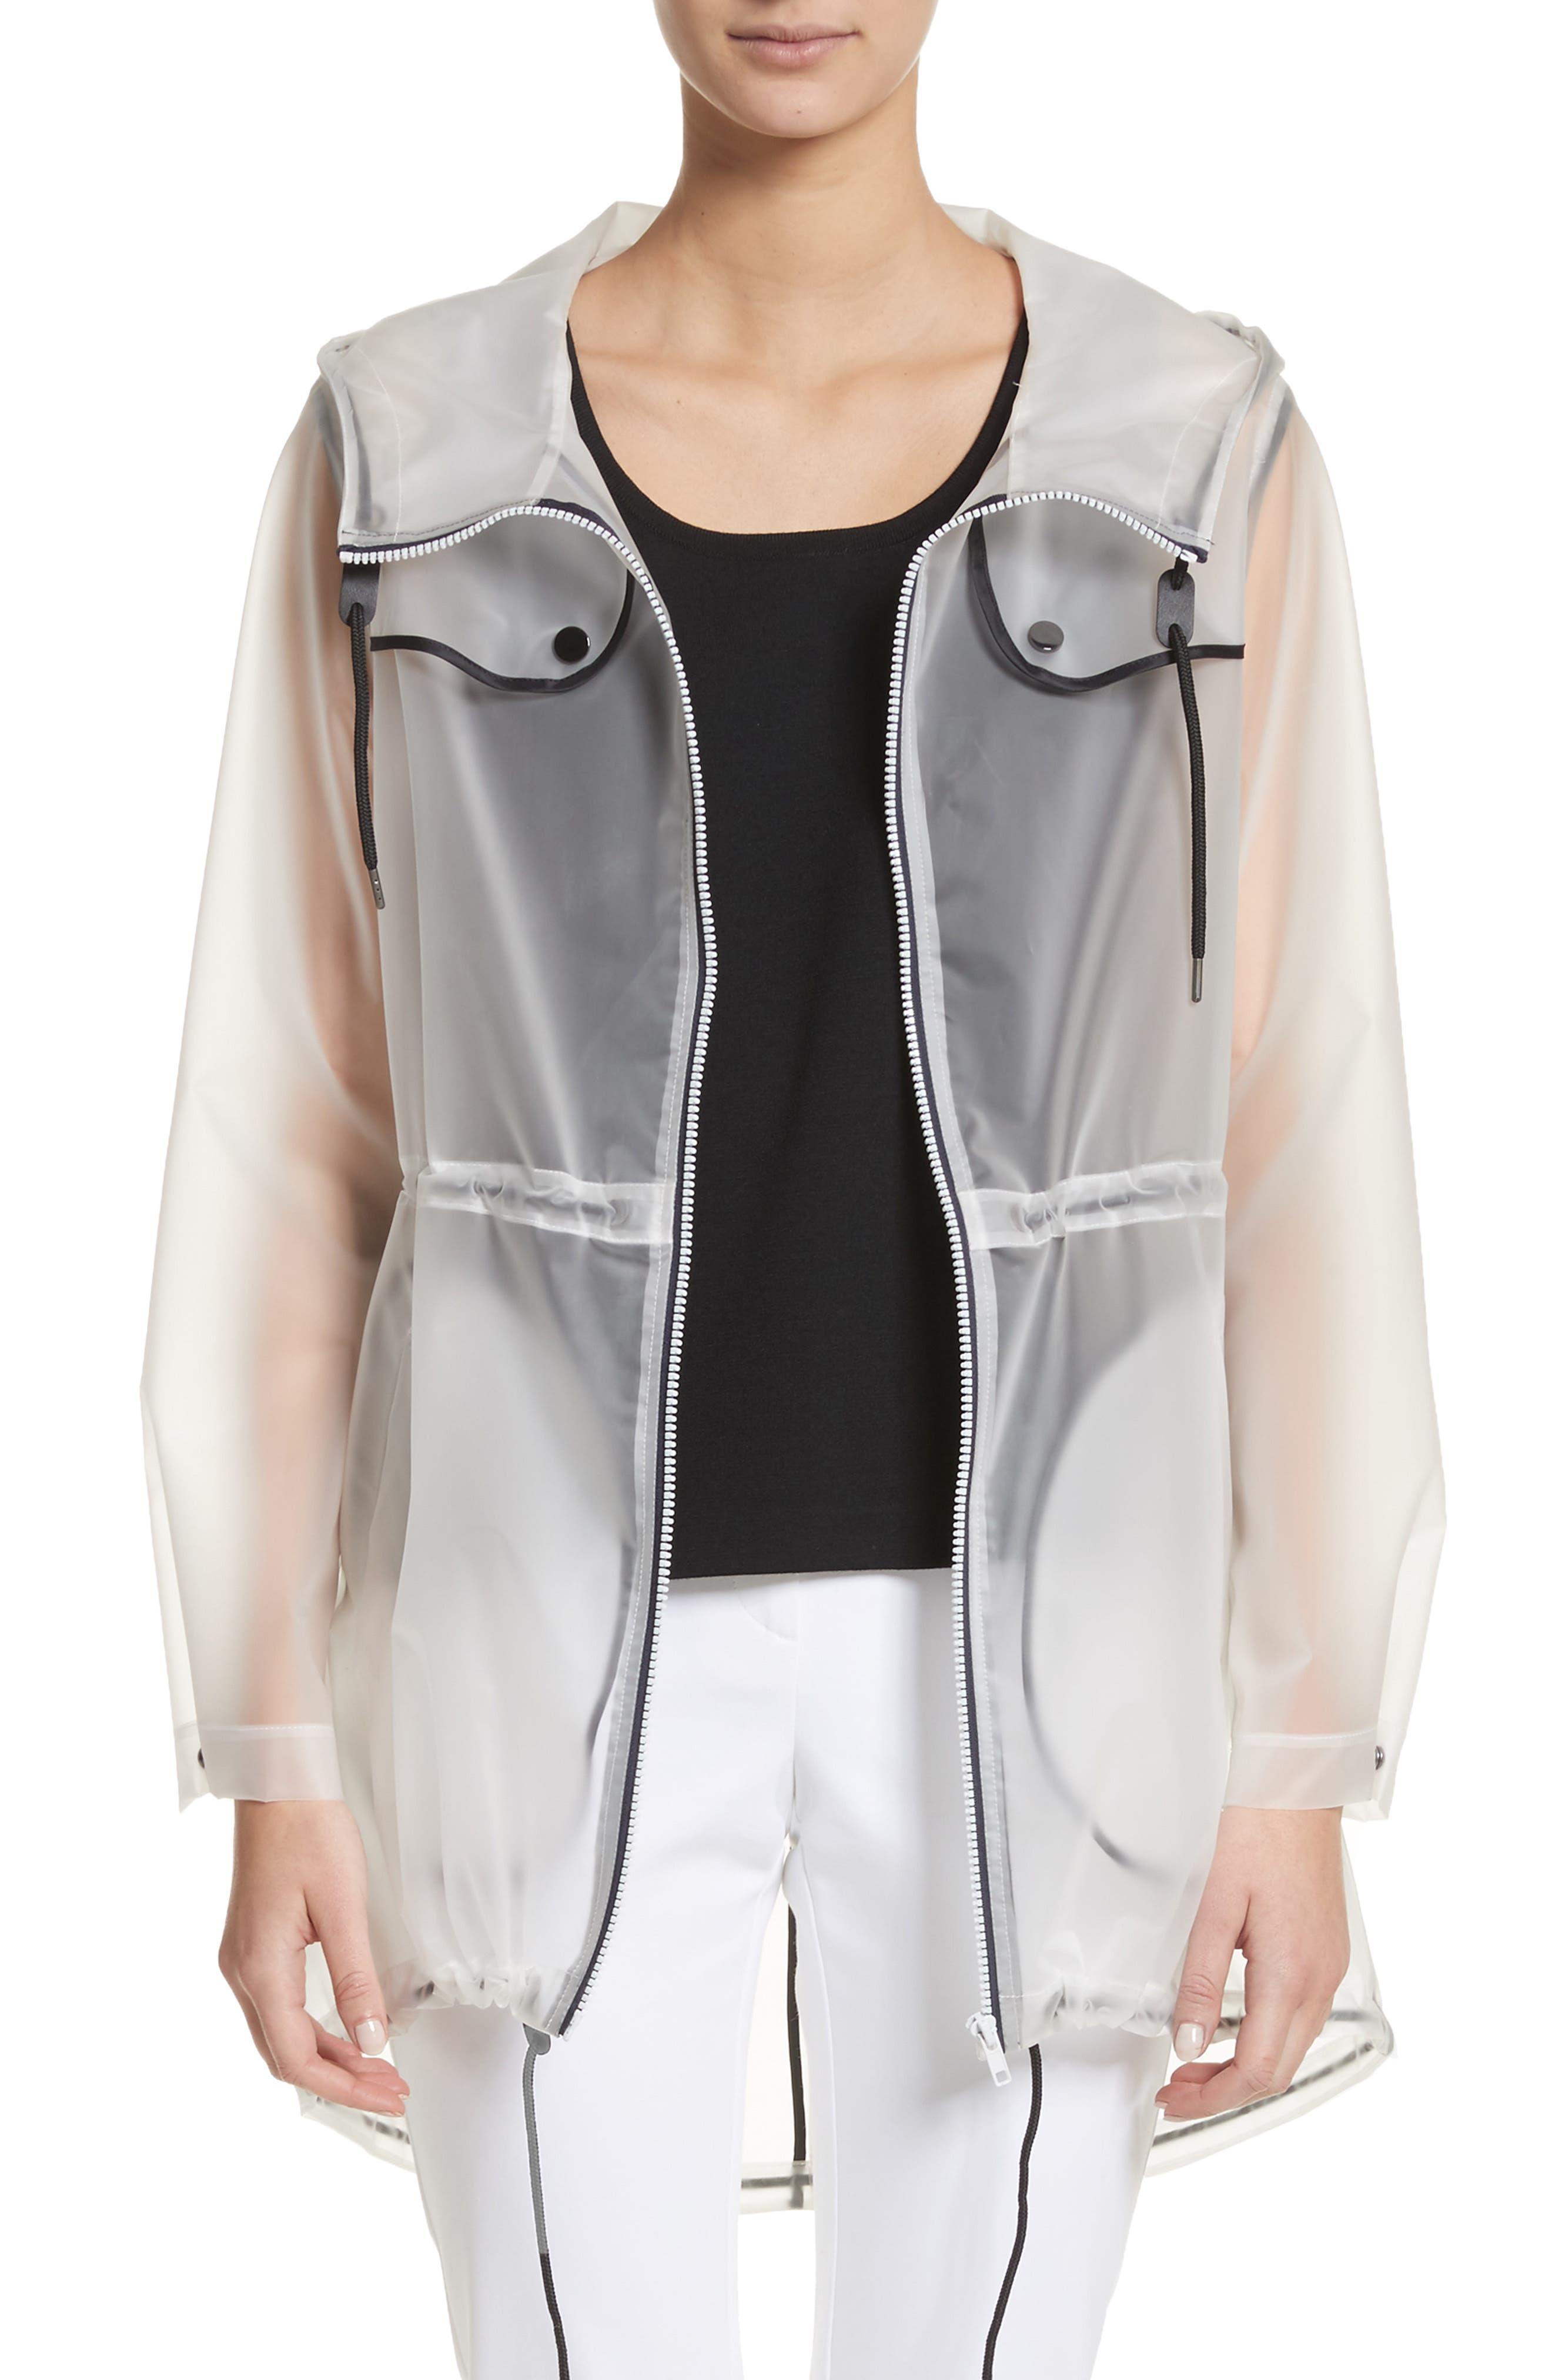 Clear Hooded Raincoat,                             Main thumbnail 1, color,                             White